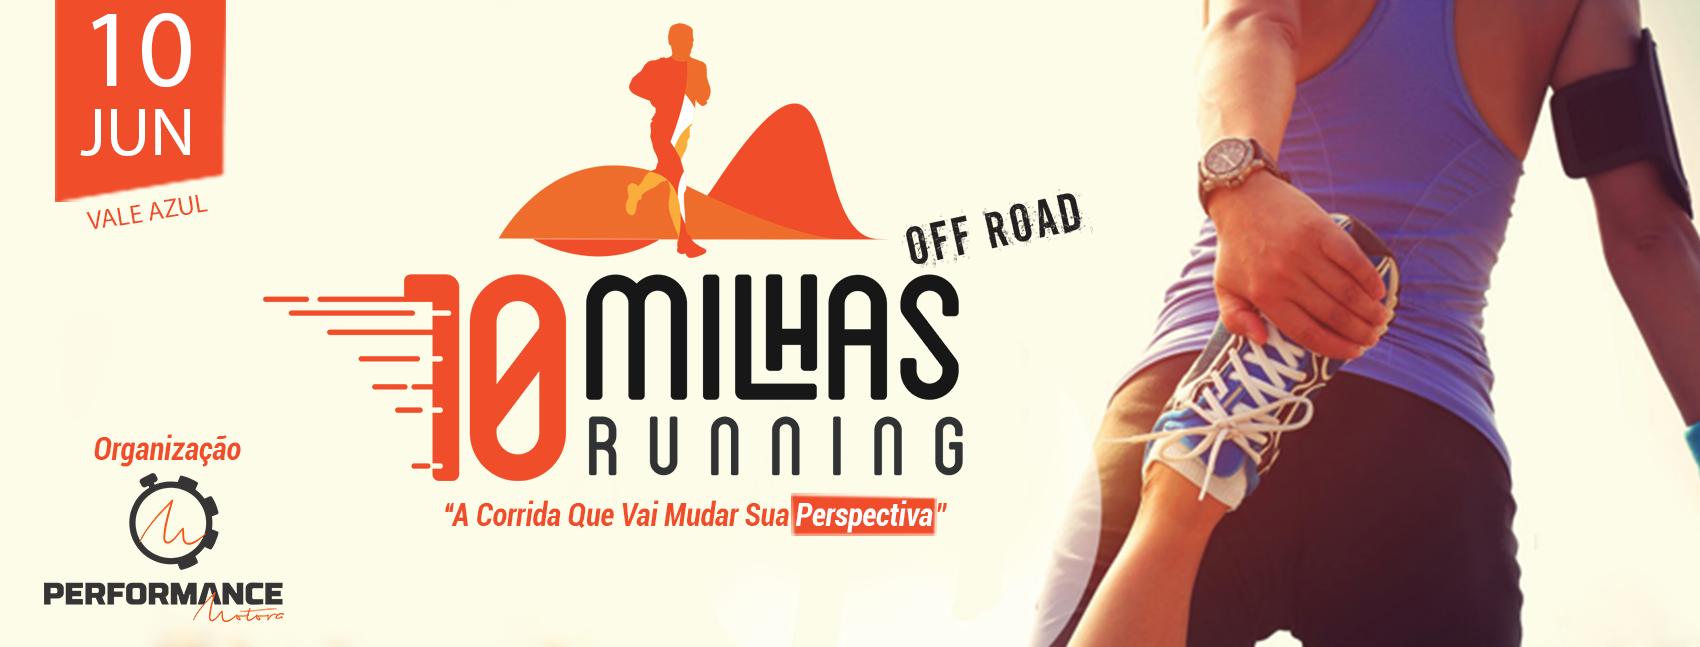 10 MILHAS RUNNING OFF ROAD - VALE AZUL